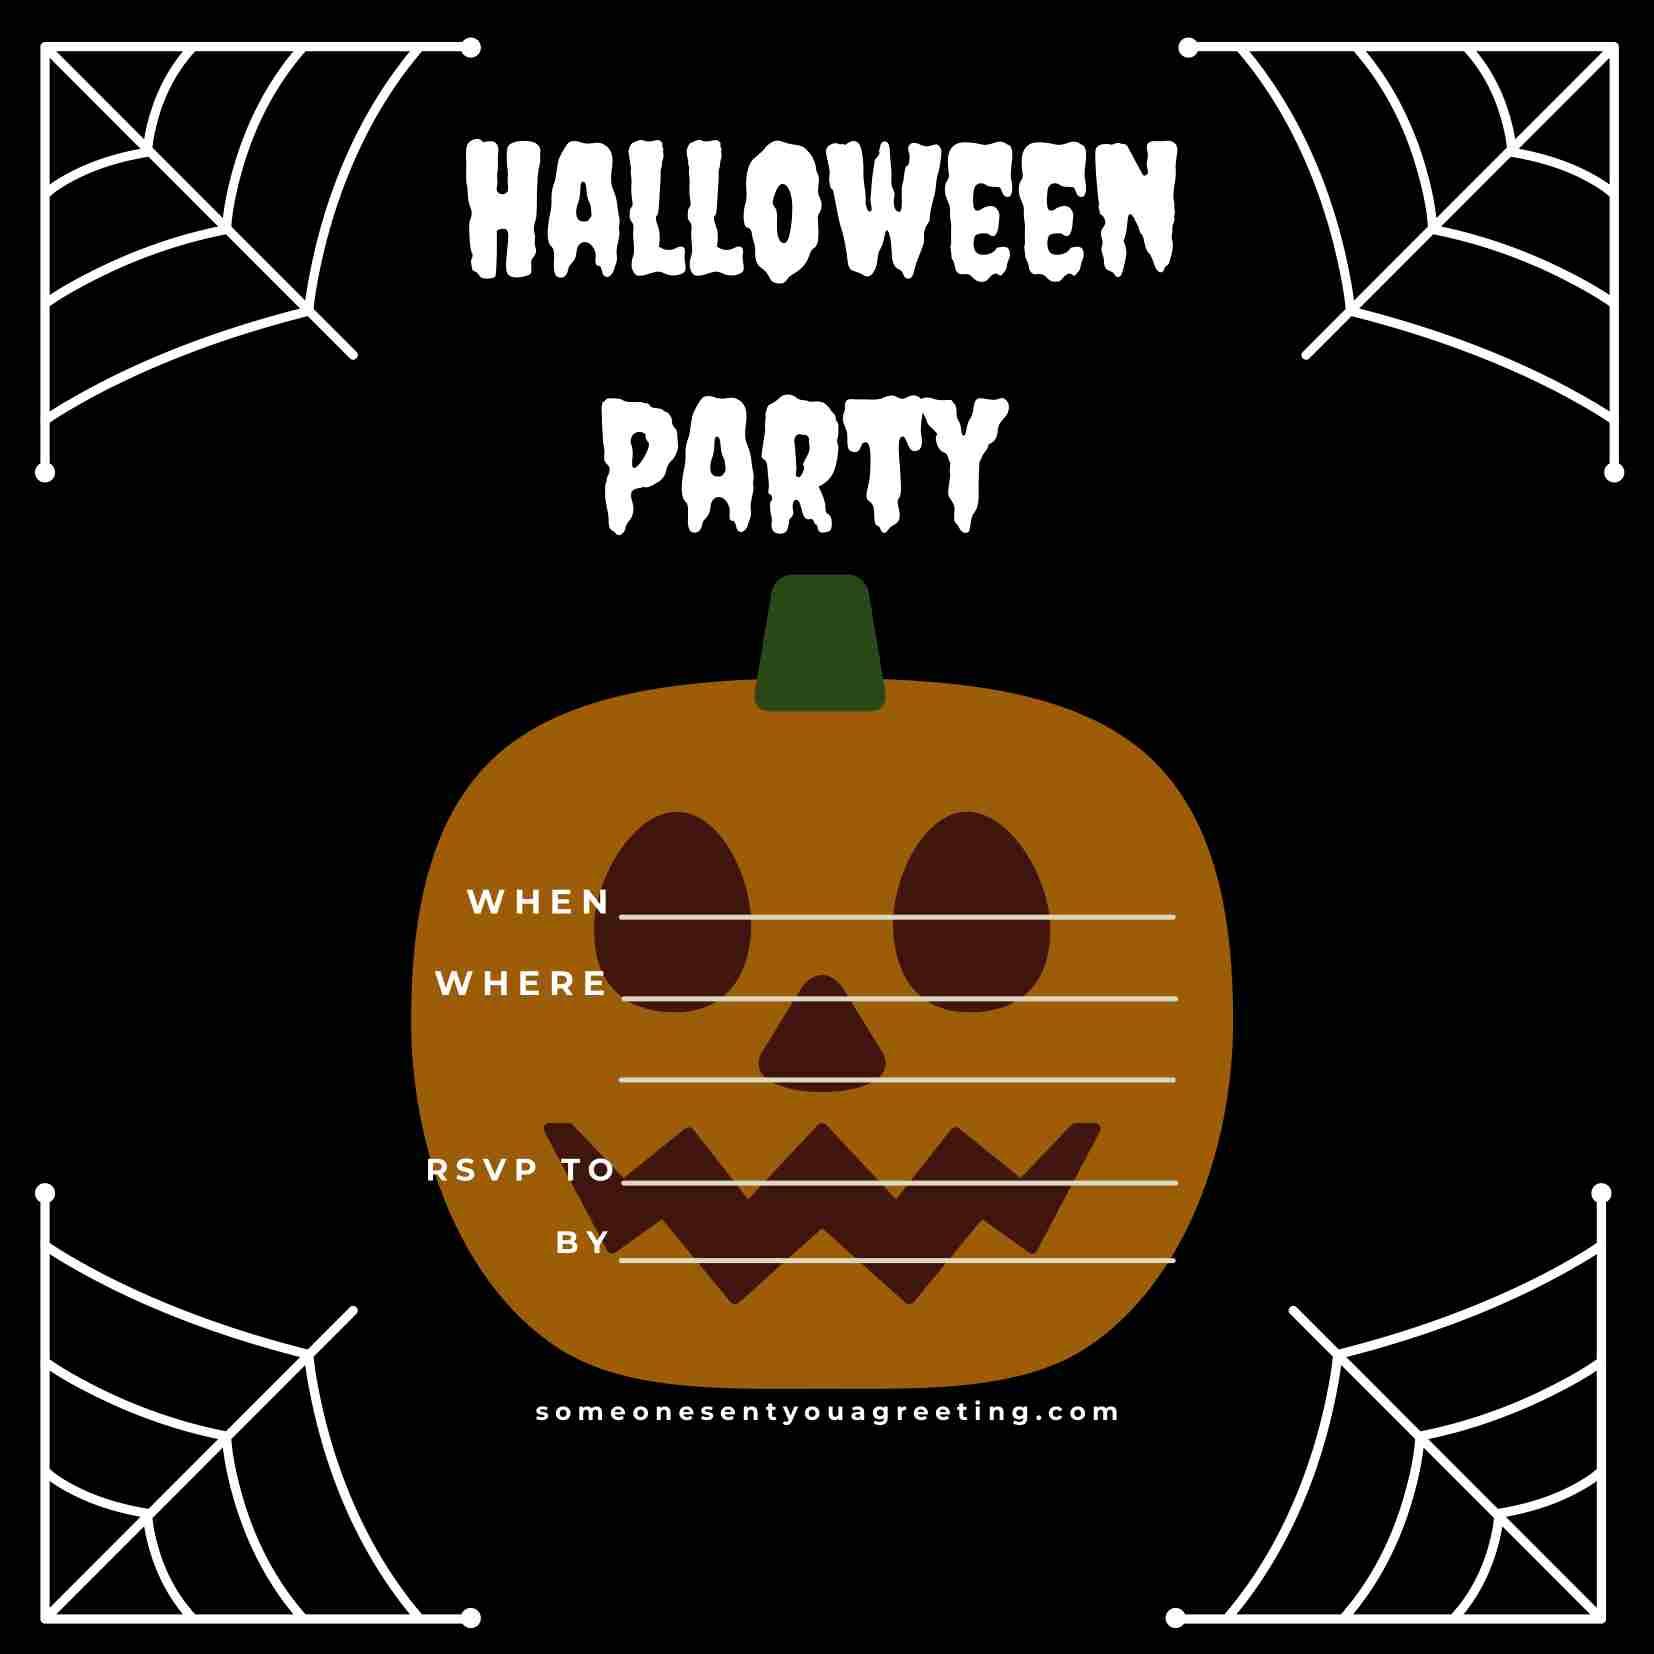 Halloween Party Invitation sample